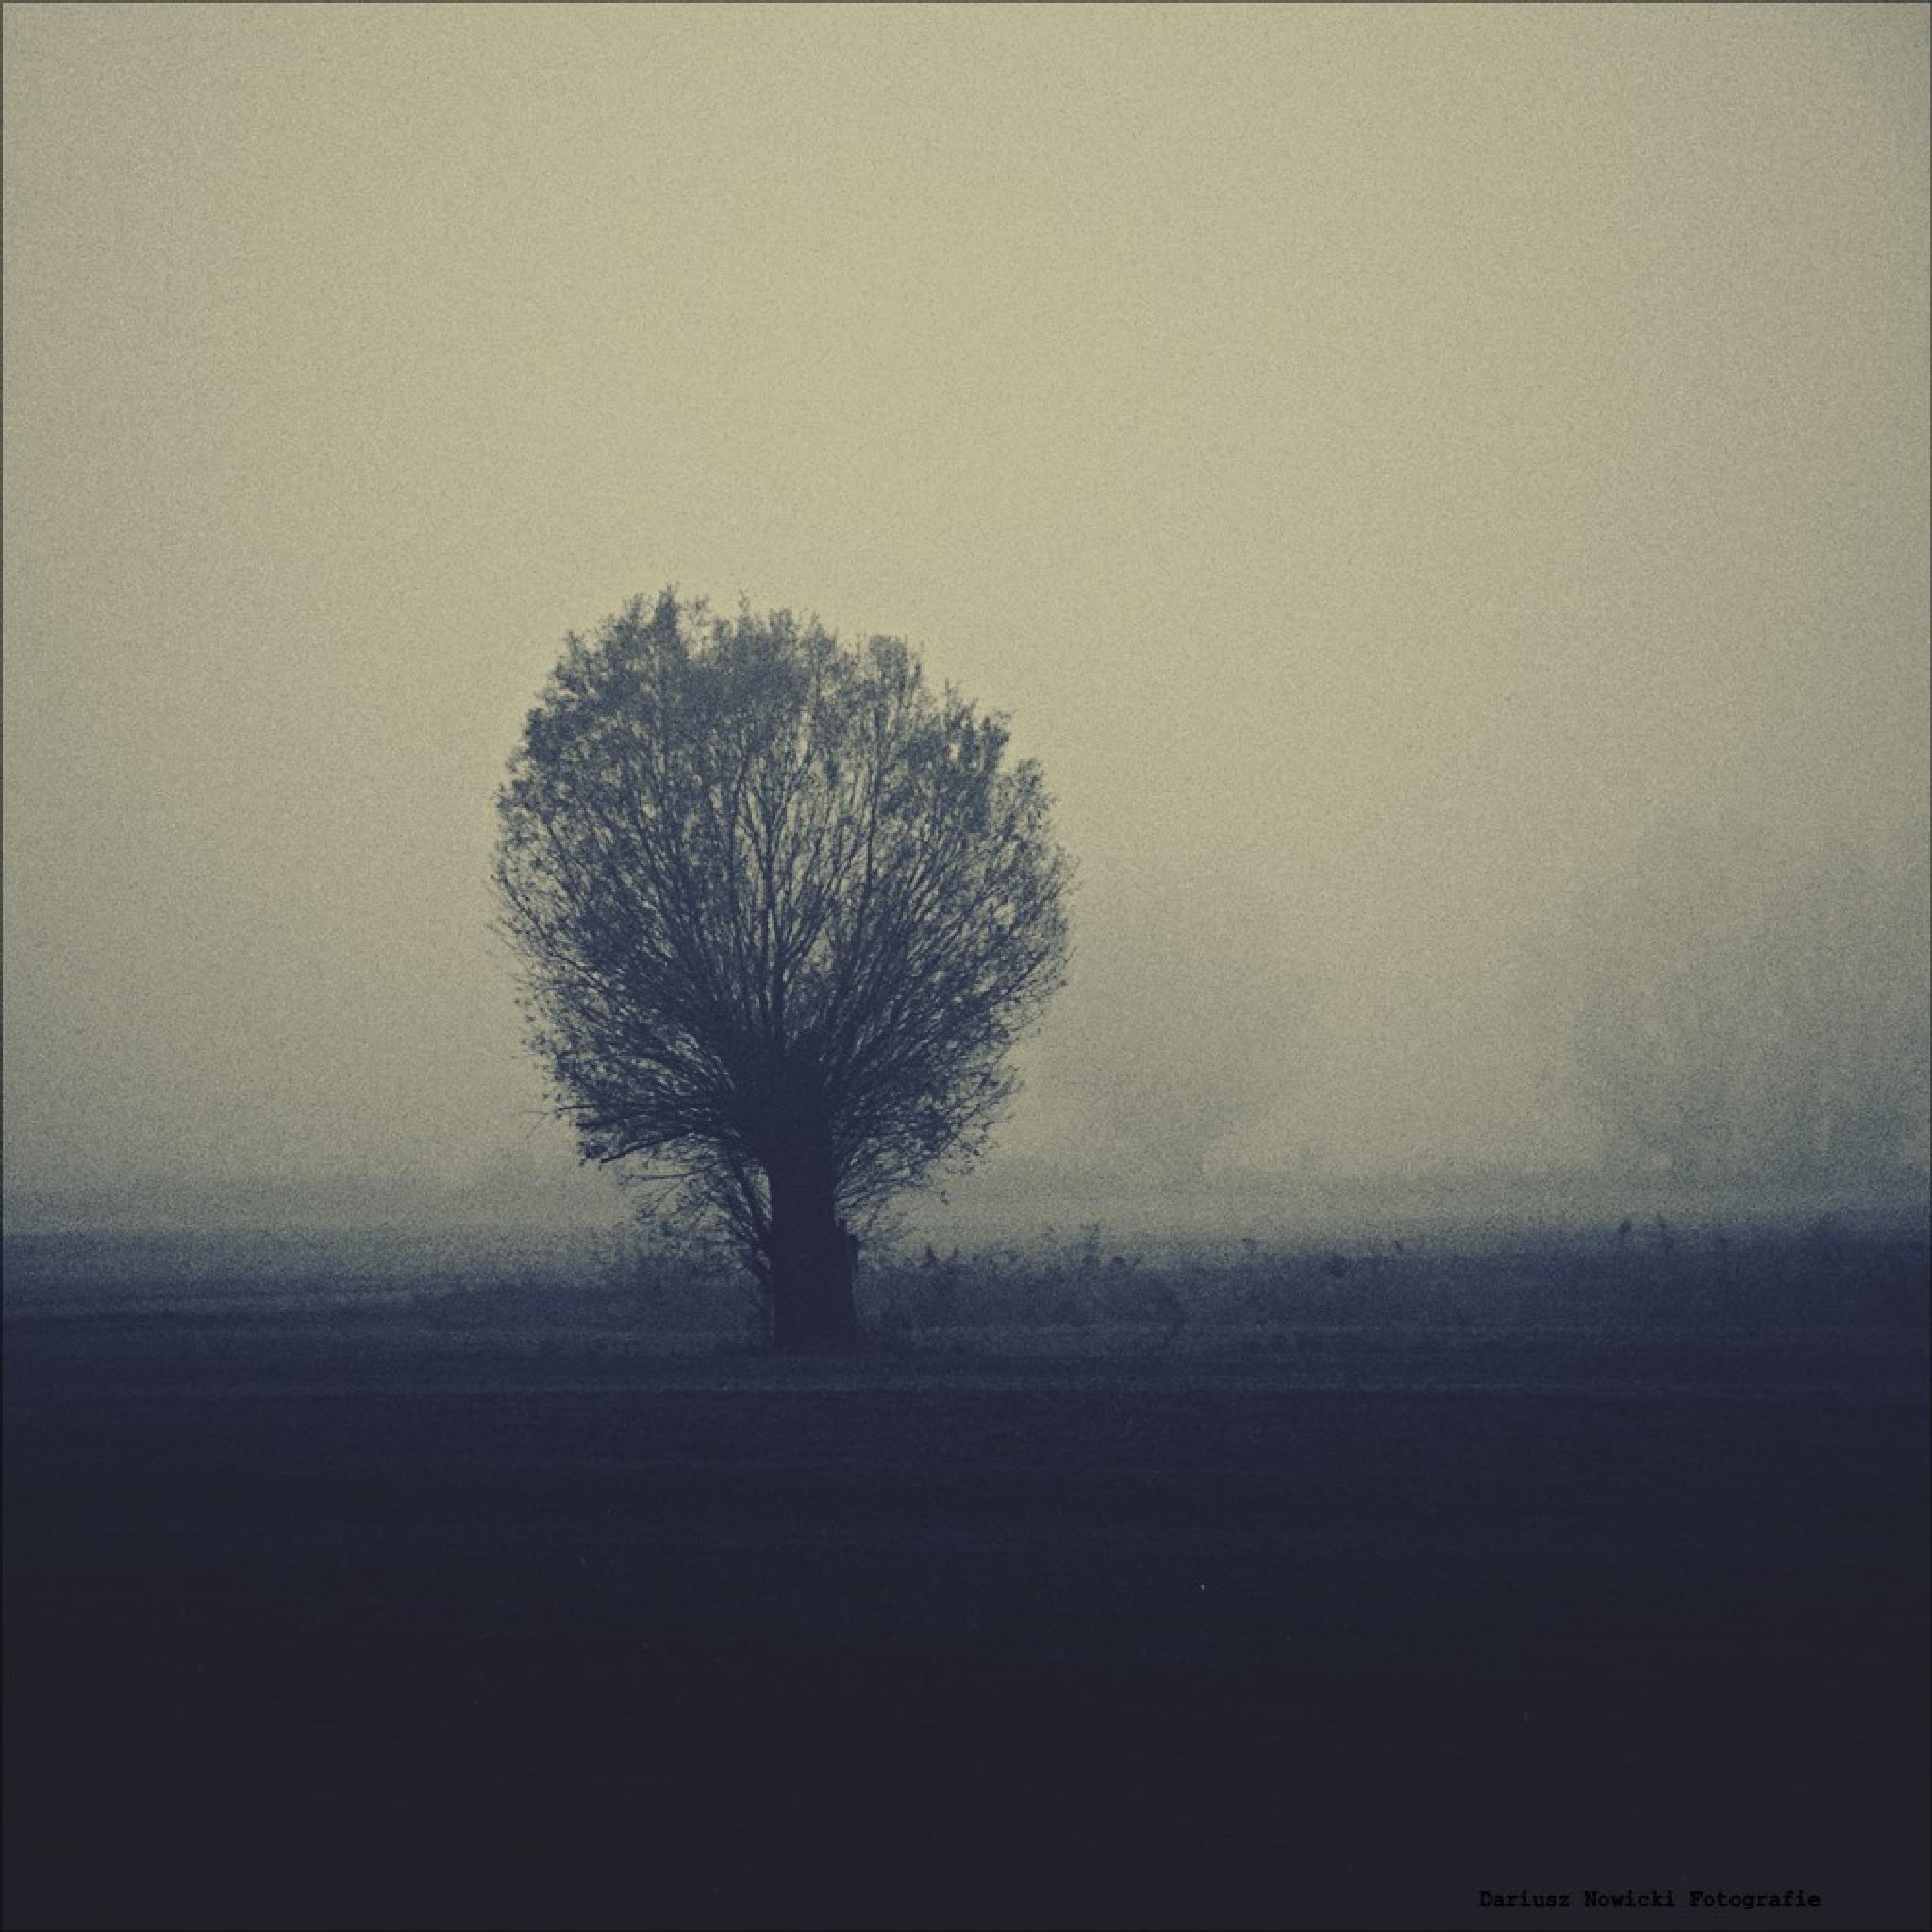 Untitled by darnowic